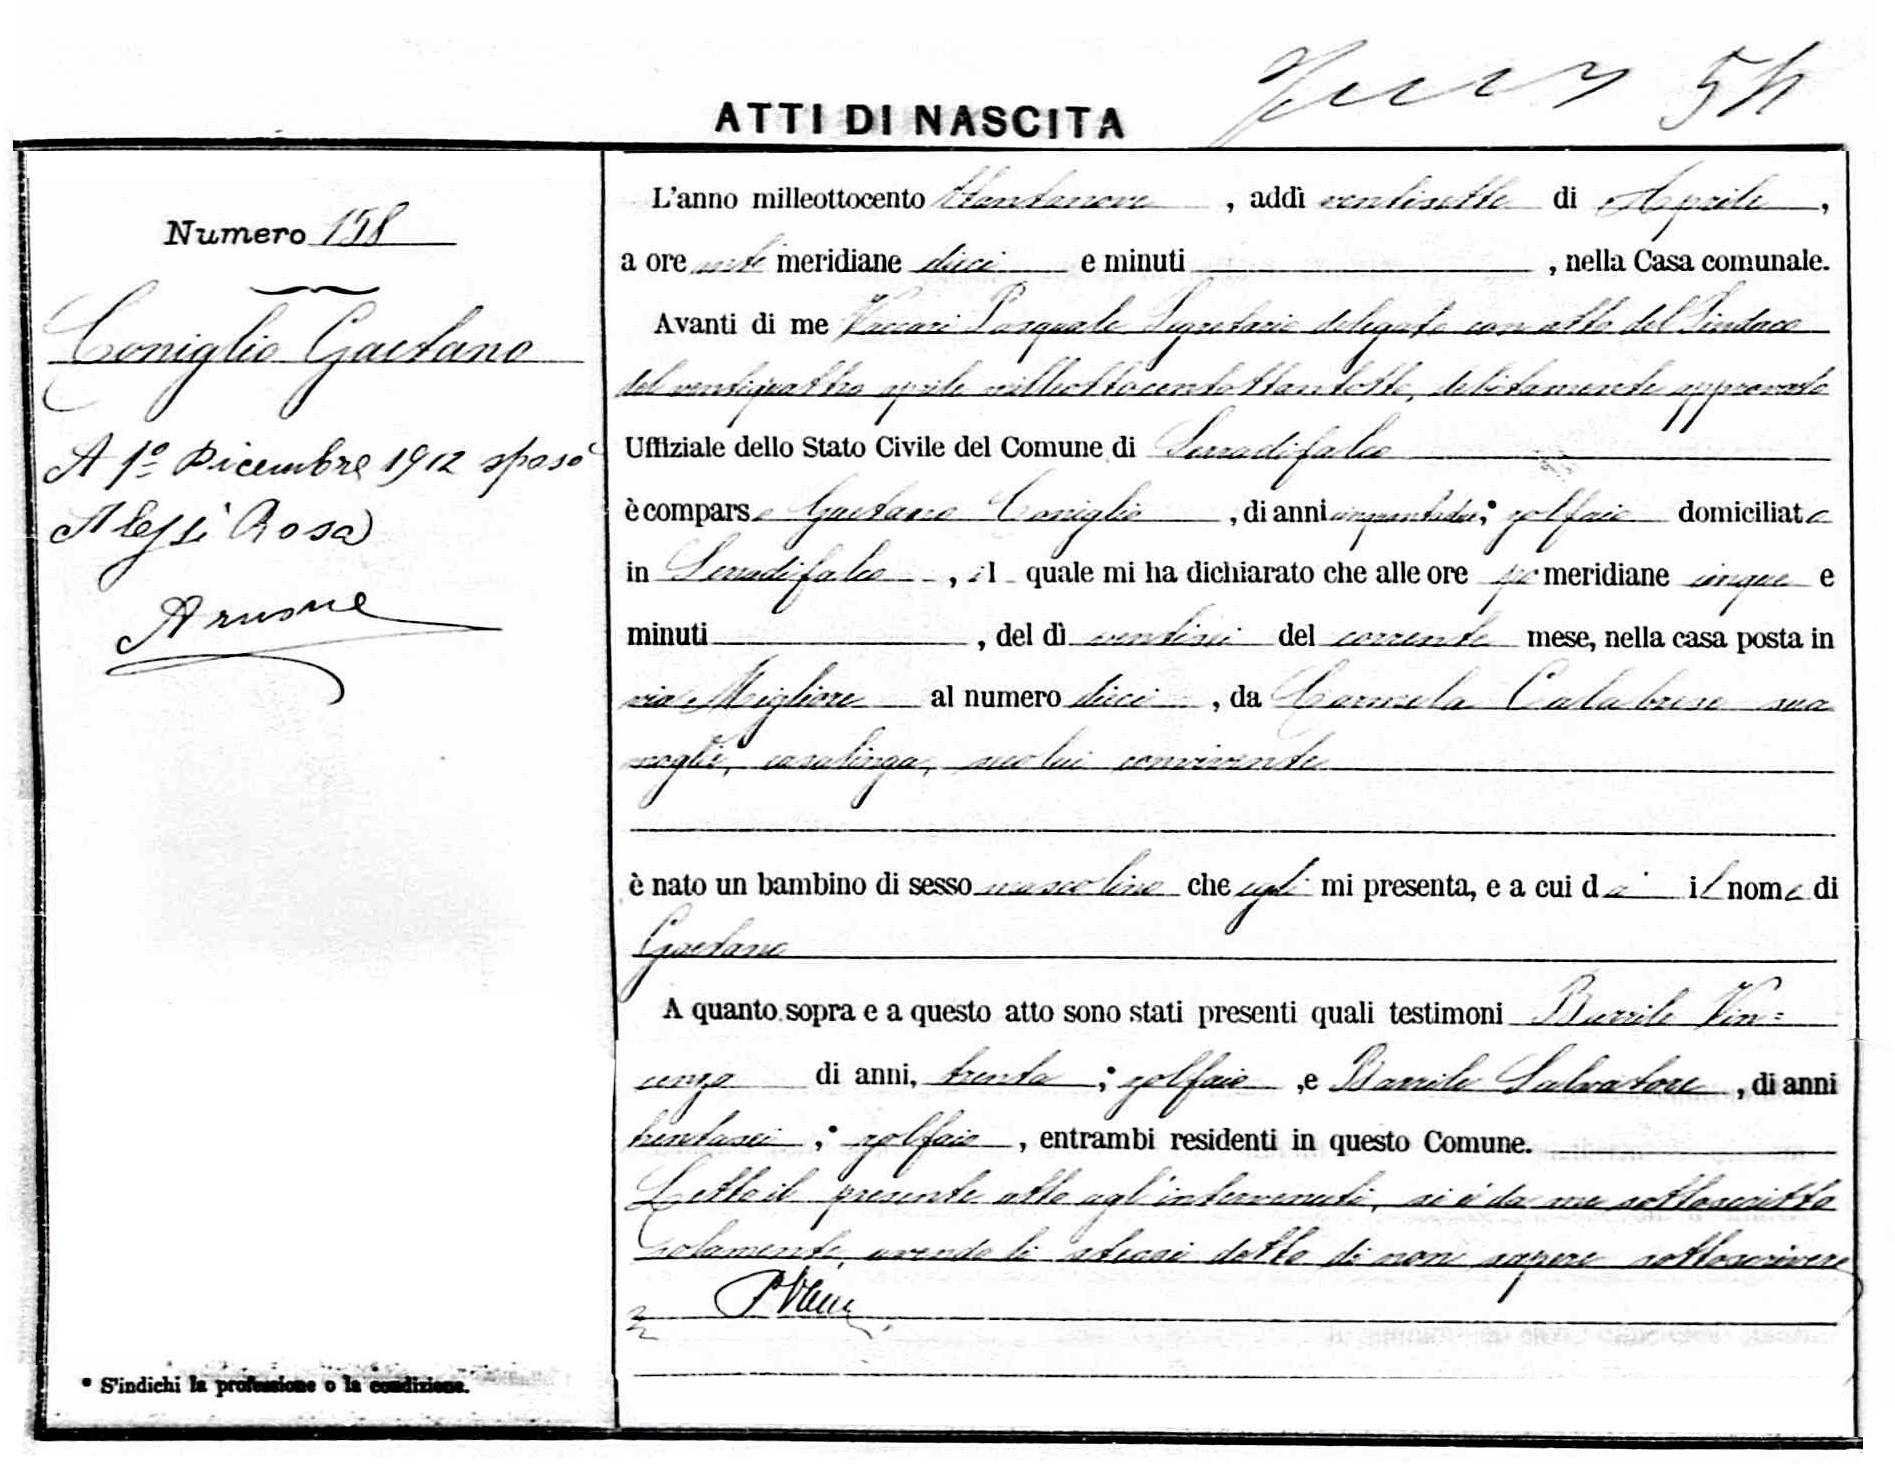 Translator Italian: Gaetano Coniglio Di Serradifarcu